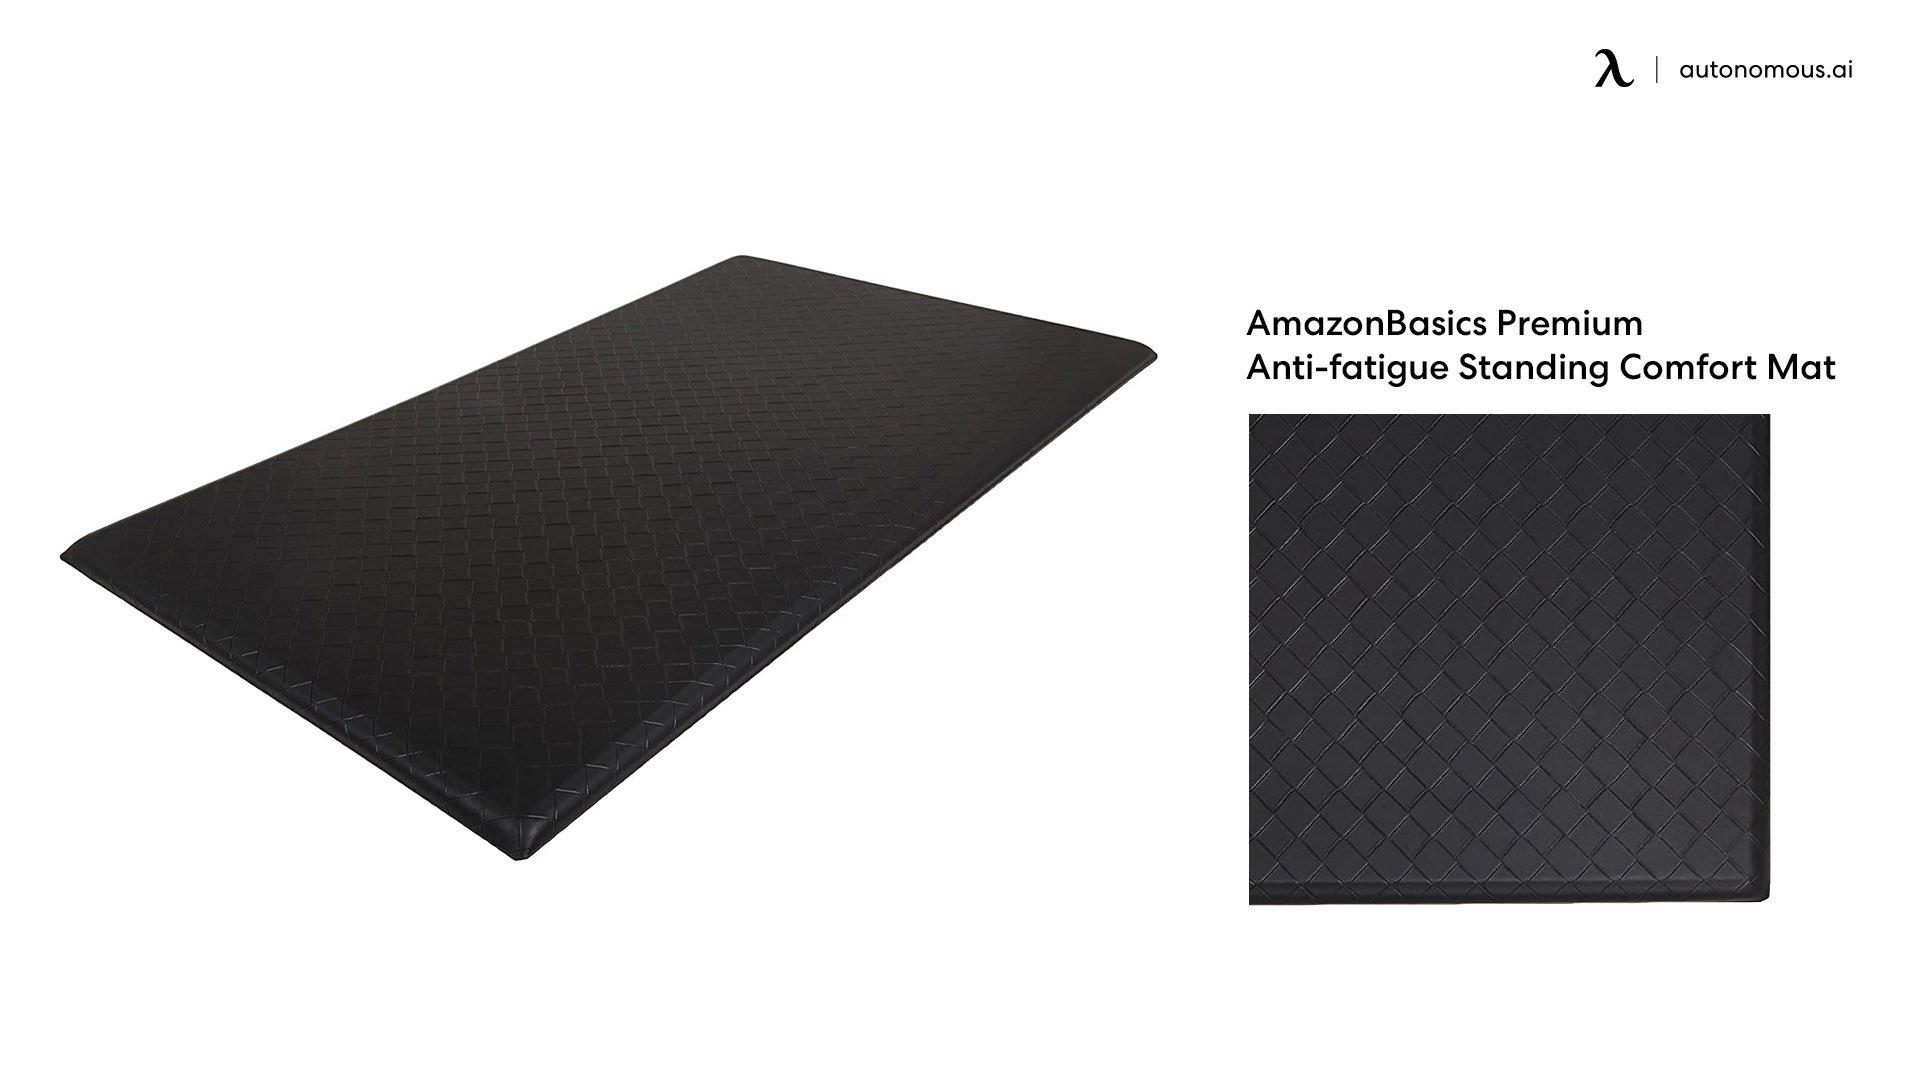 AmazonBasics Premium Mat for a Sit-Stand Desk